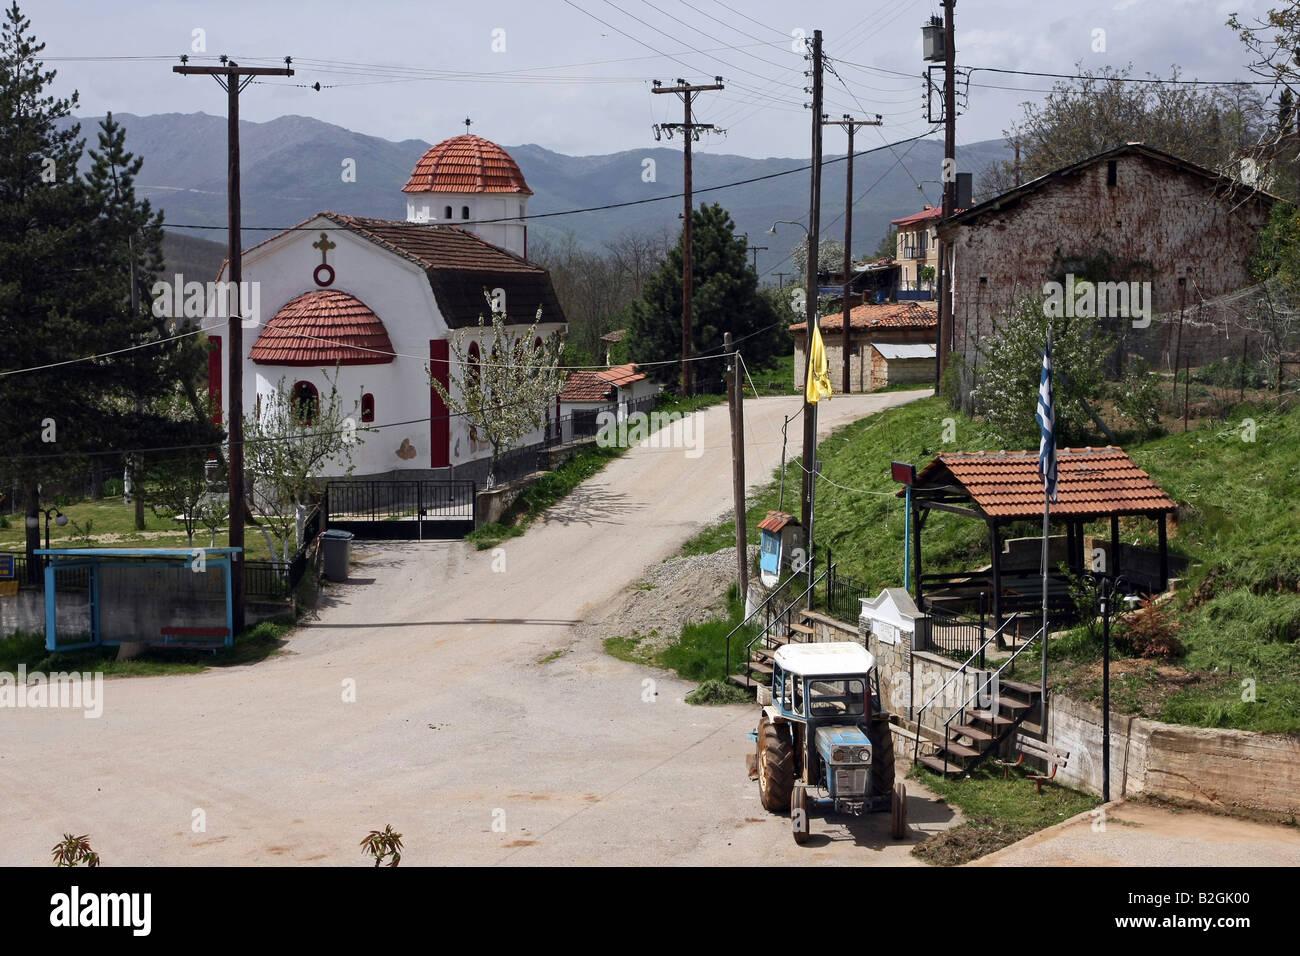 Greece Macedonia Antonios a small farming village the church in the centre - Stock Image